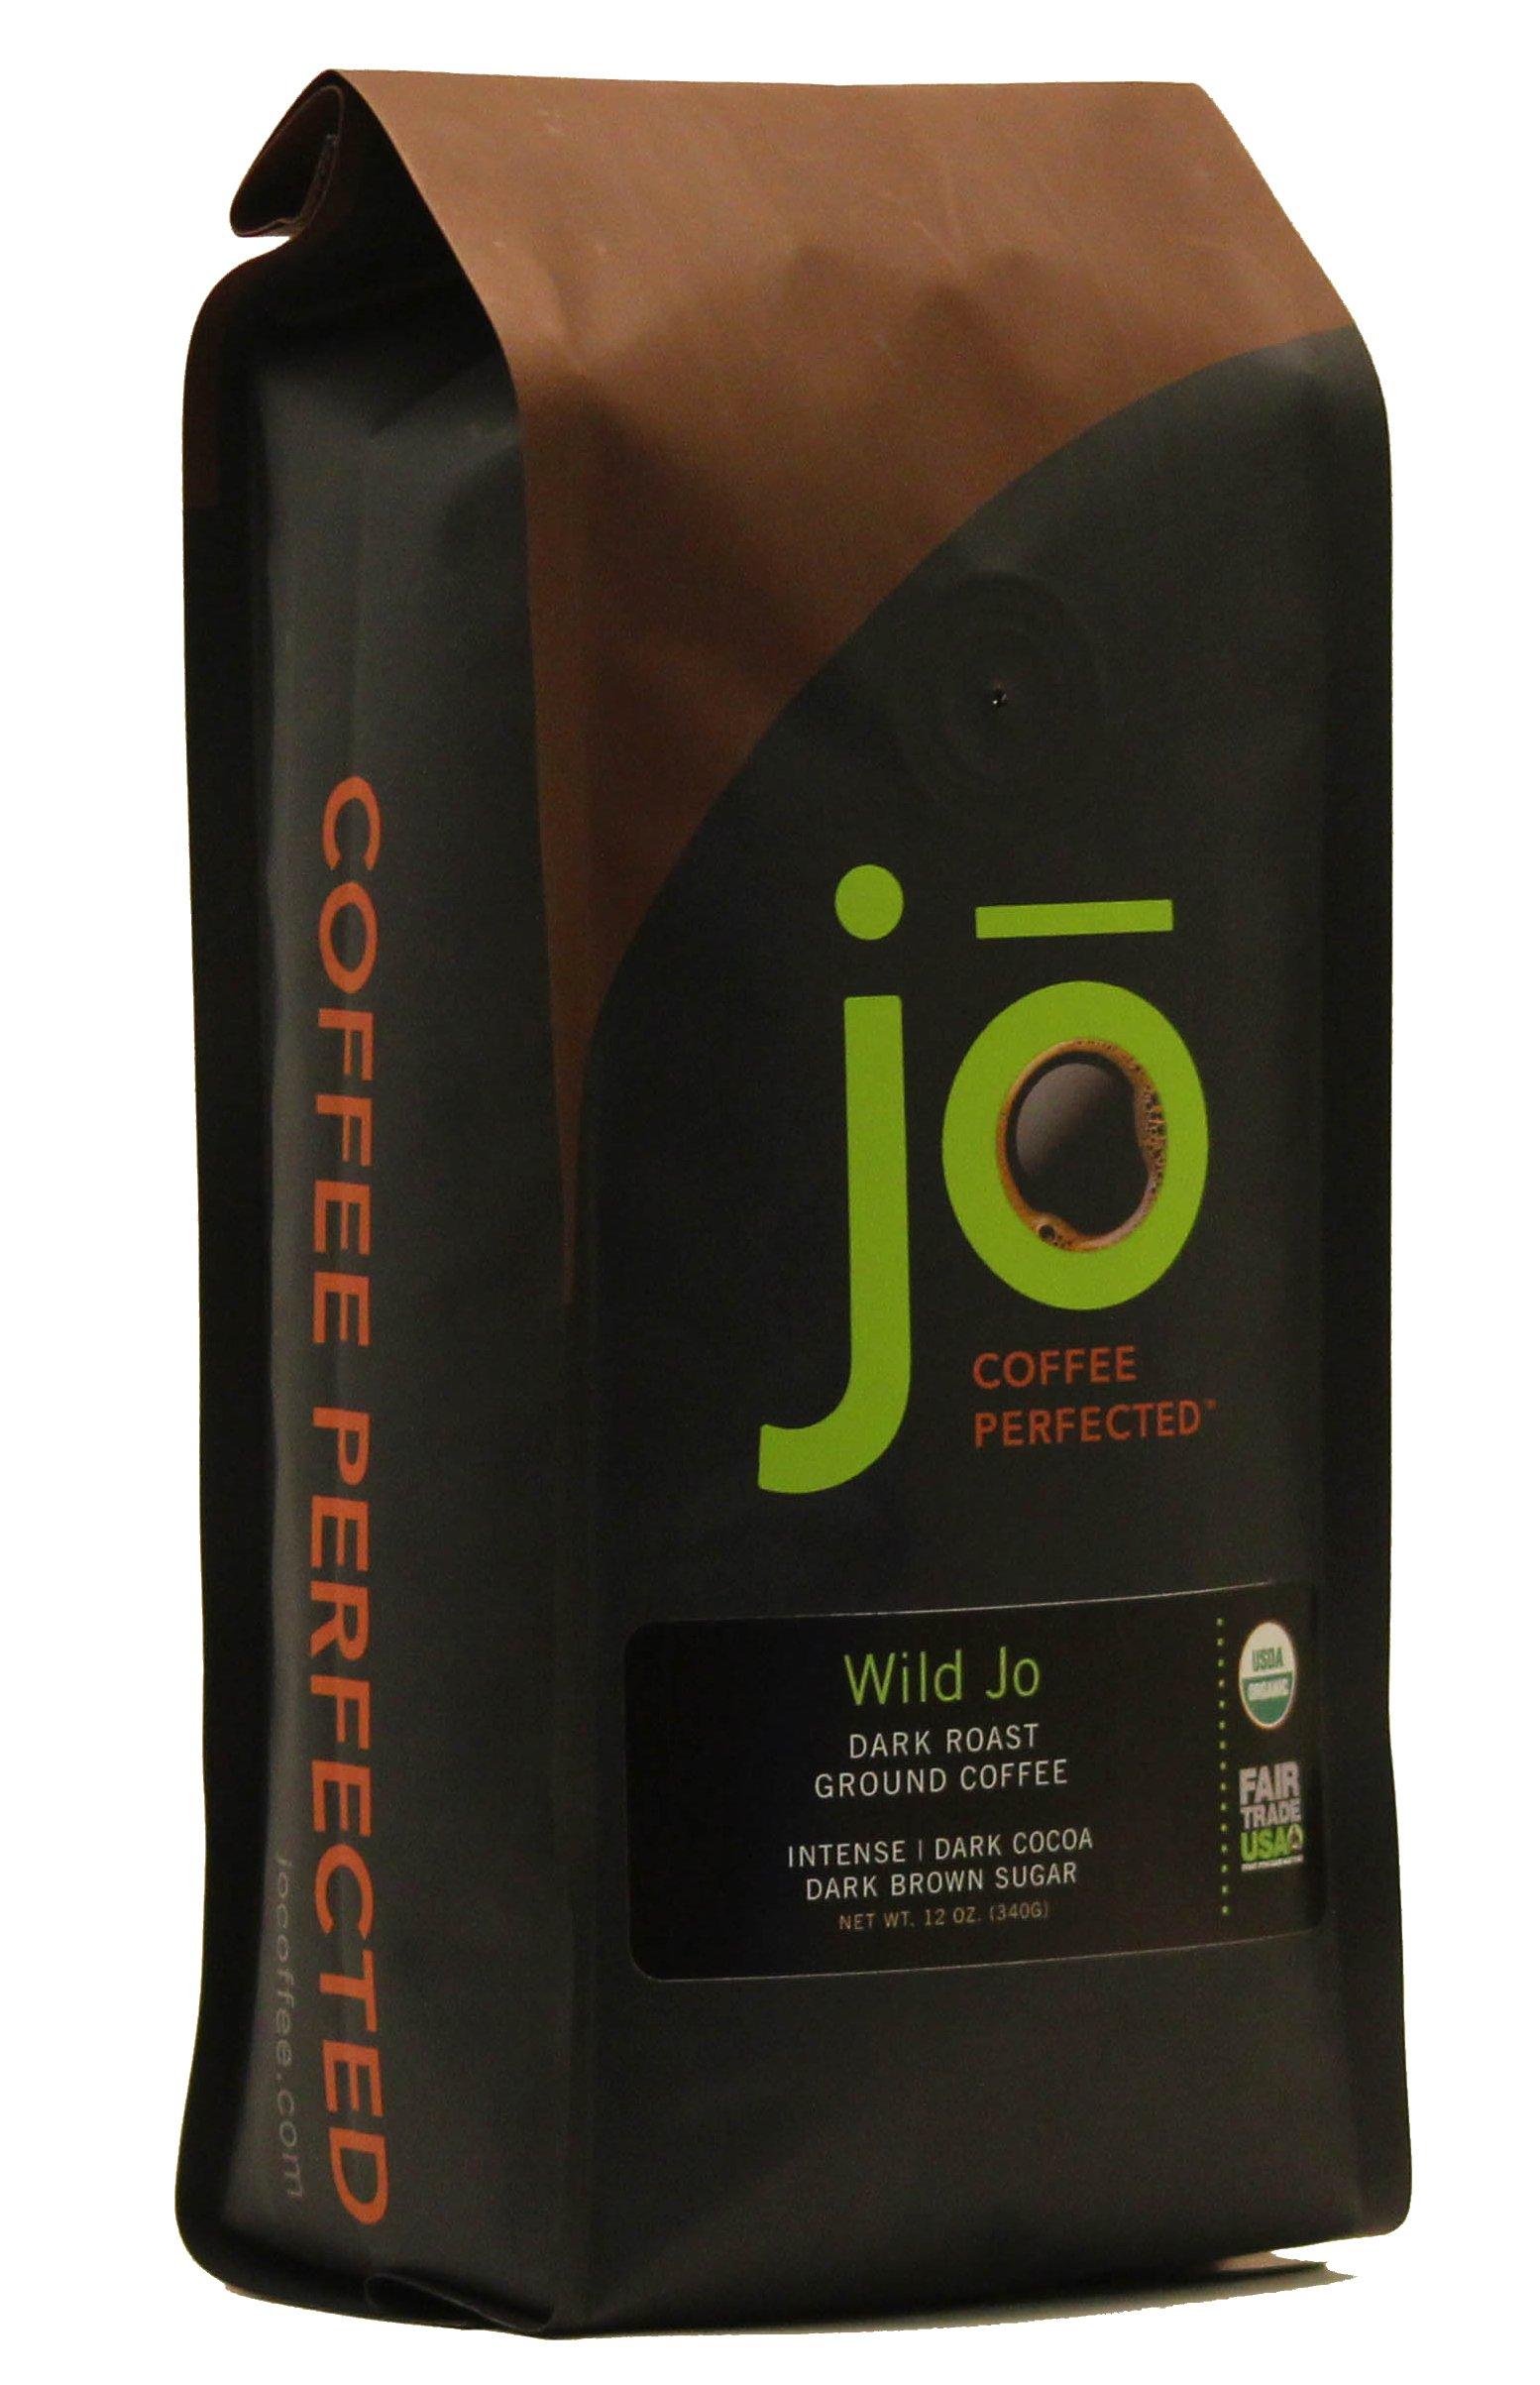 WILD JO: 12 oz, Dark French Roast Organic Coffee, Ground Coffee, Bold Strong Rich Wicked Good Coffee! Great Brewed or Espresso, USDA Certified Fair Trade Organic, 100% Arabica Coffee, NON-GMO